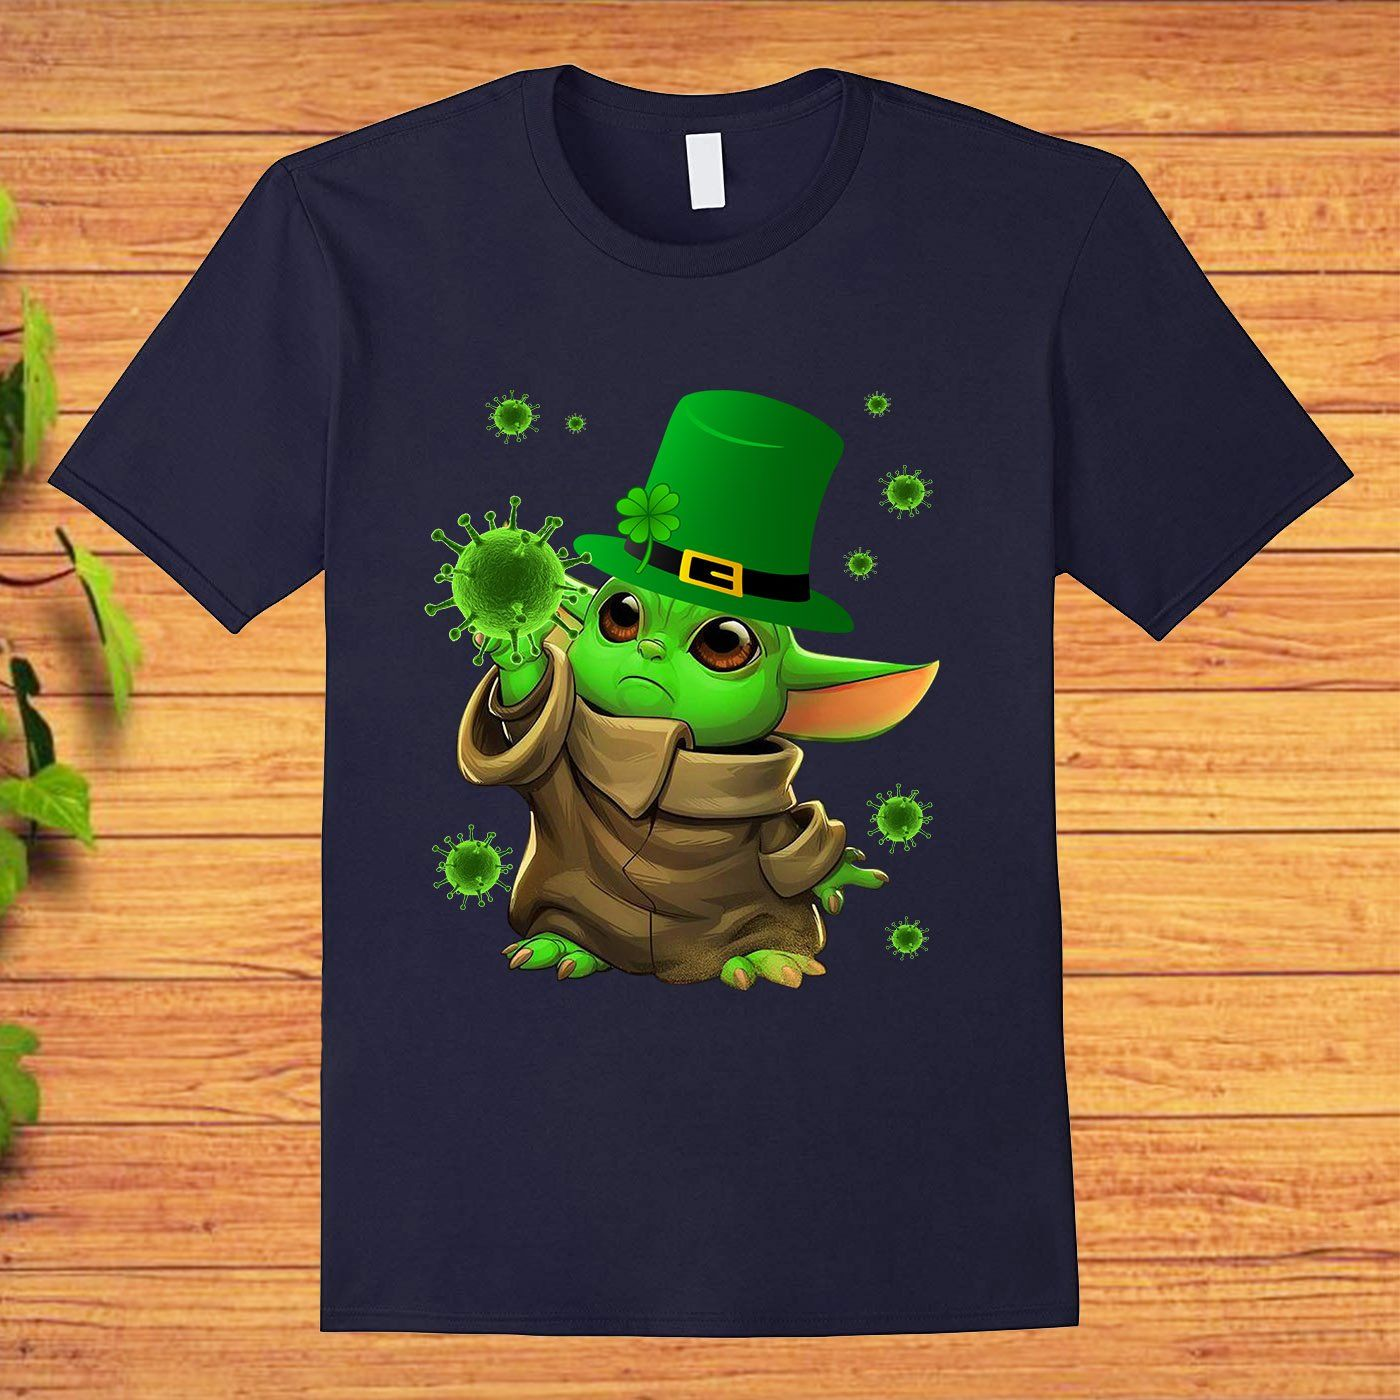 Baby Yoda Coronavirus COVID-19 St Patrick���s Day T-shirt